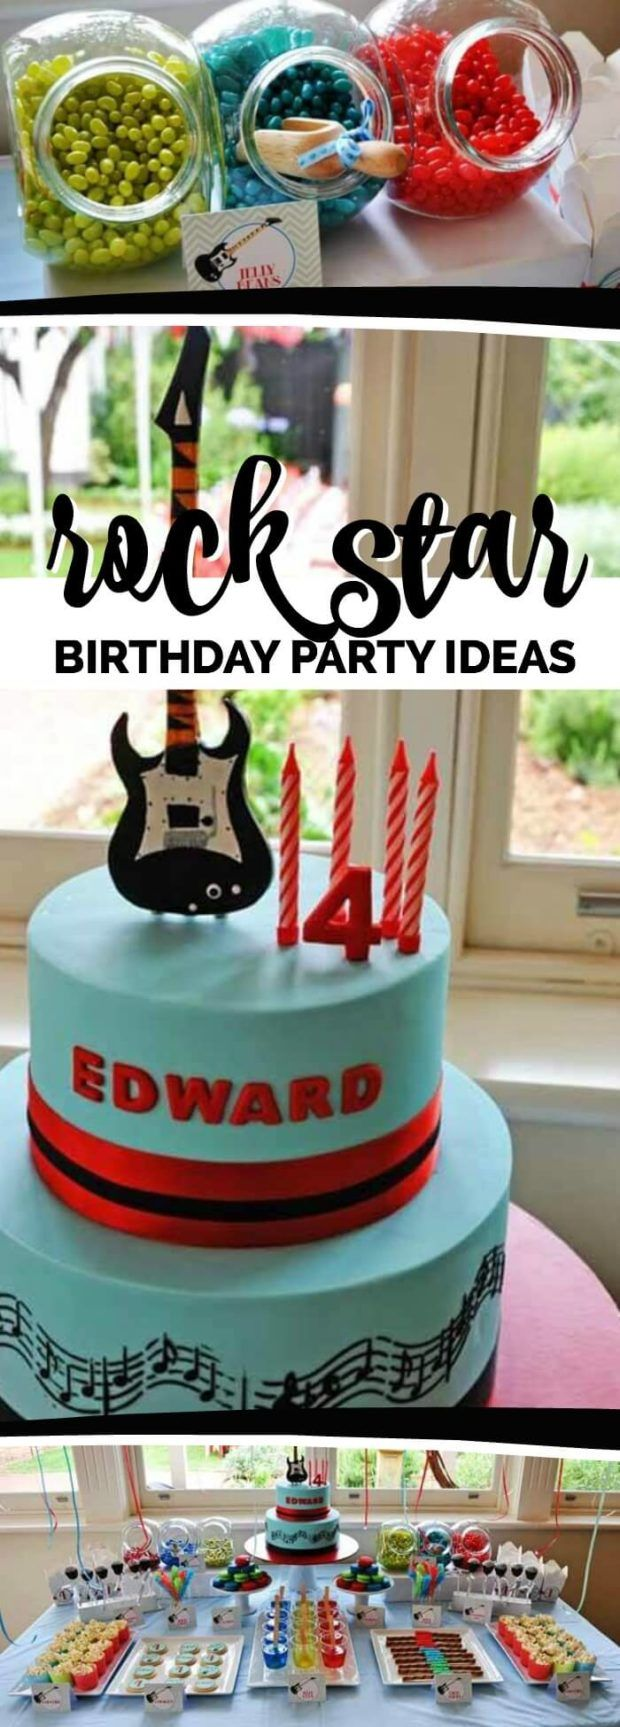 Guitar Rock Star 4th Birthday